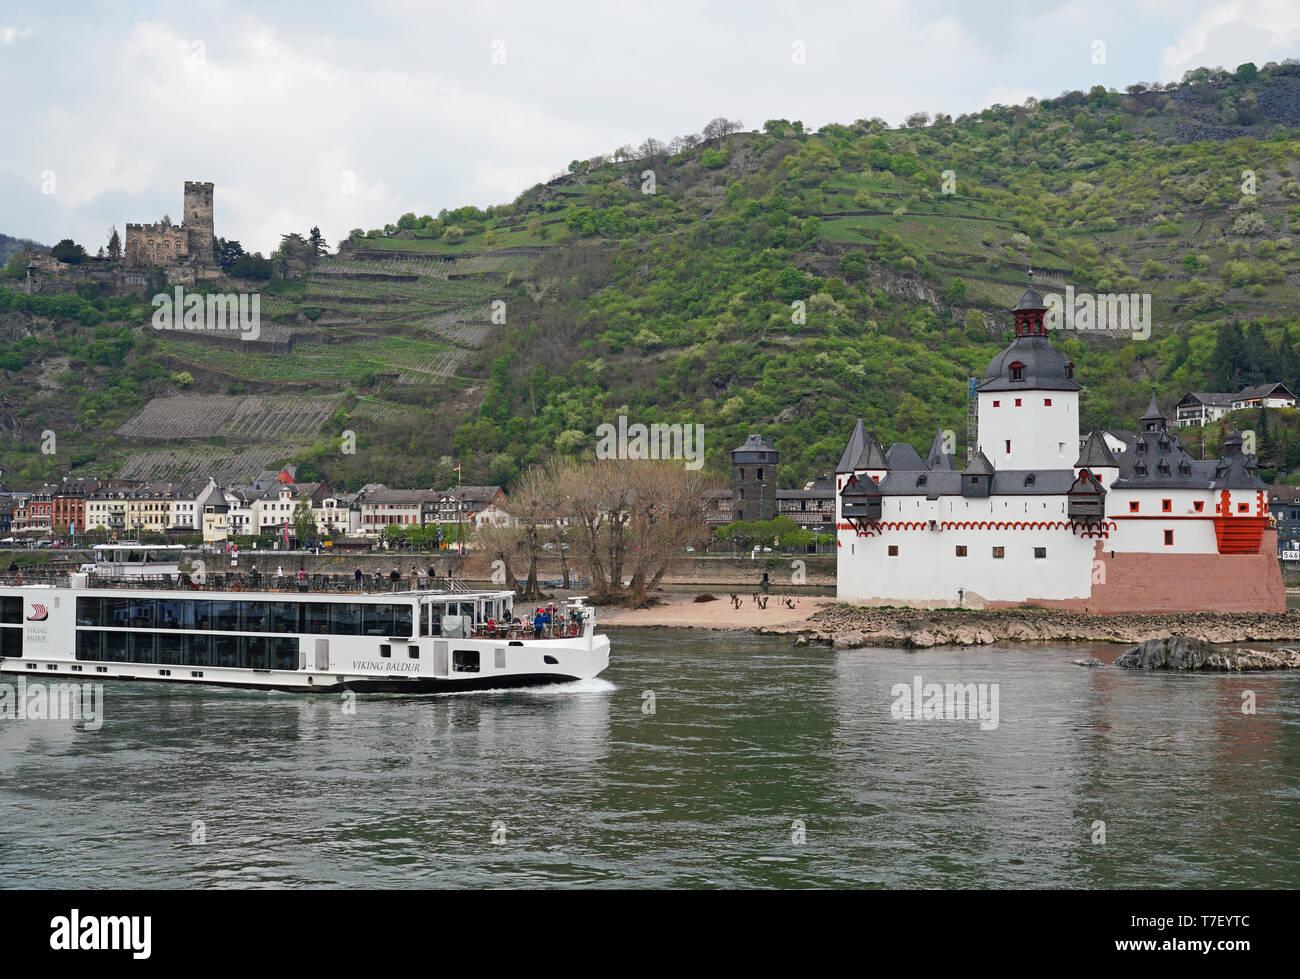 Viking River Cruises longship on Rhine River in Germany - Stock Image